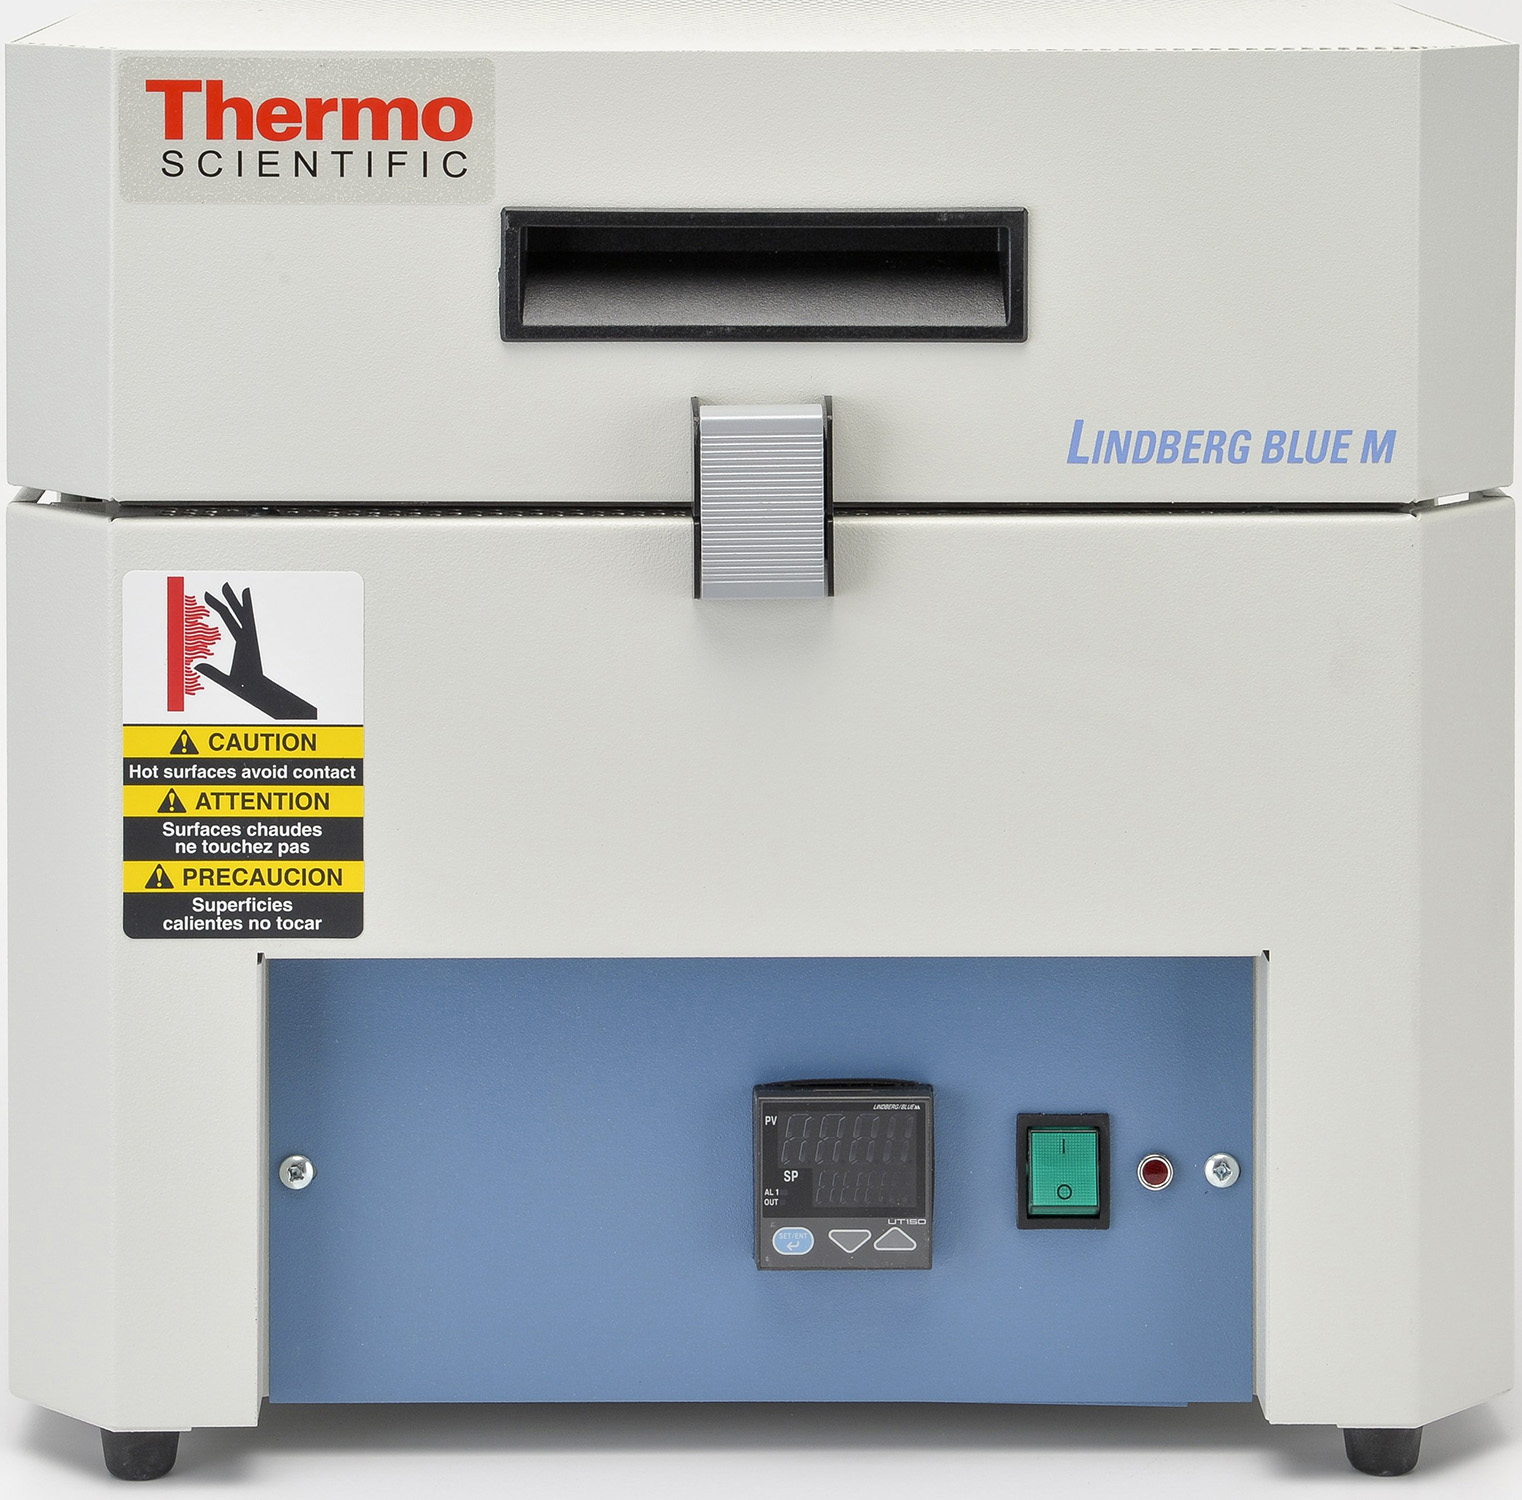 Thermo Scientific Lindberg/Blue M Mini-Mite Tube Furnace B2